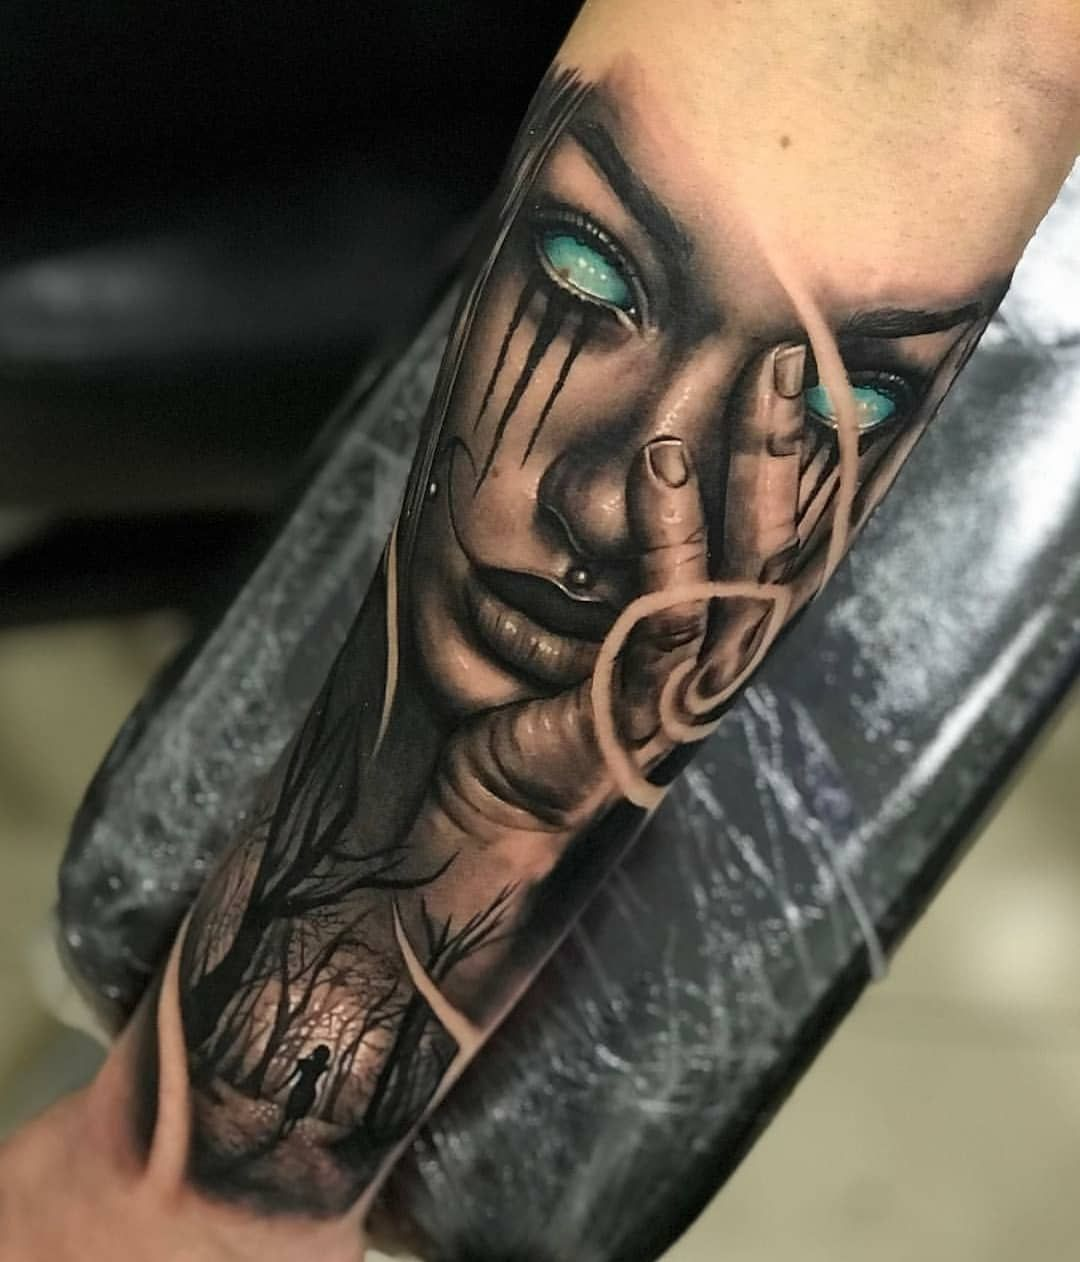 Face Sleeve Tattoo: Sleeve Tattoos Guy With Girlfriend